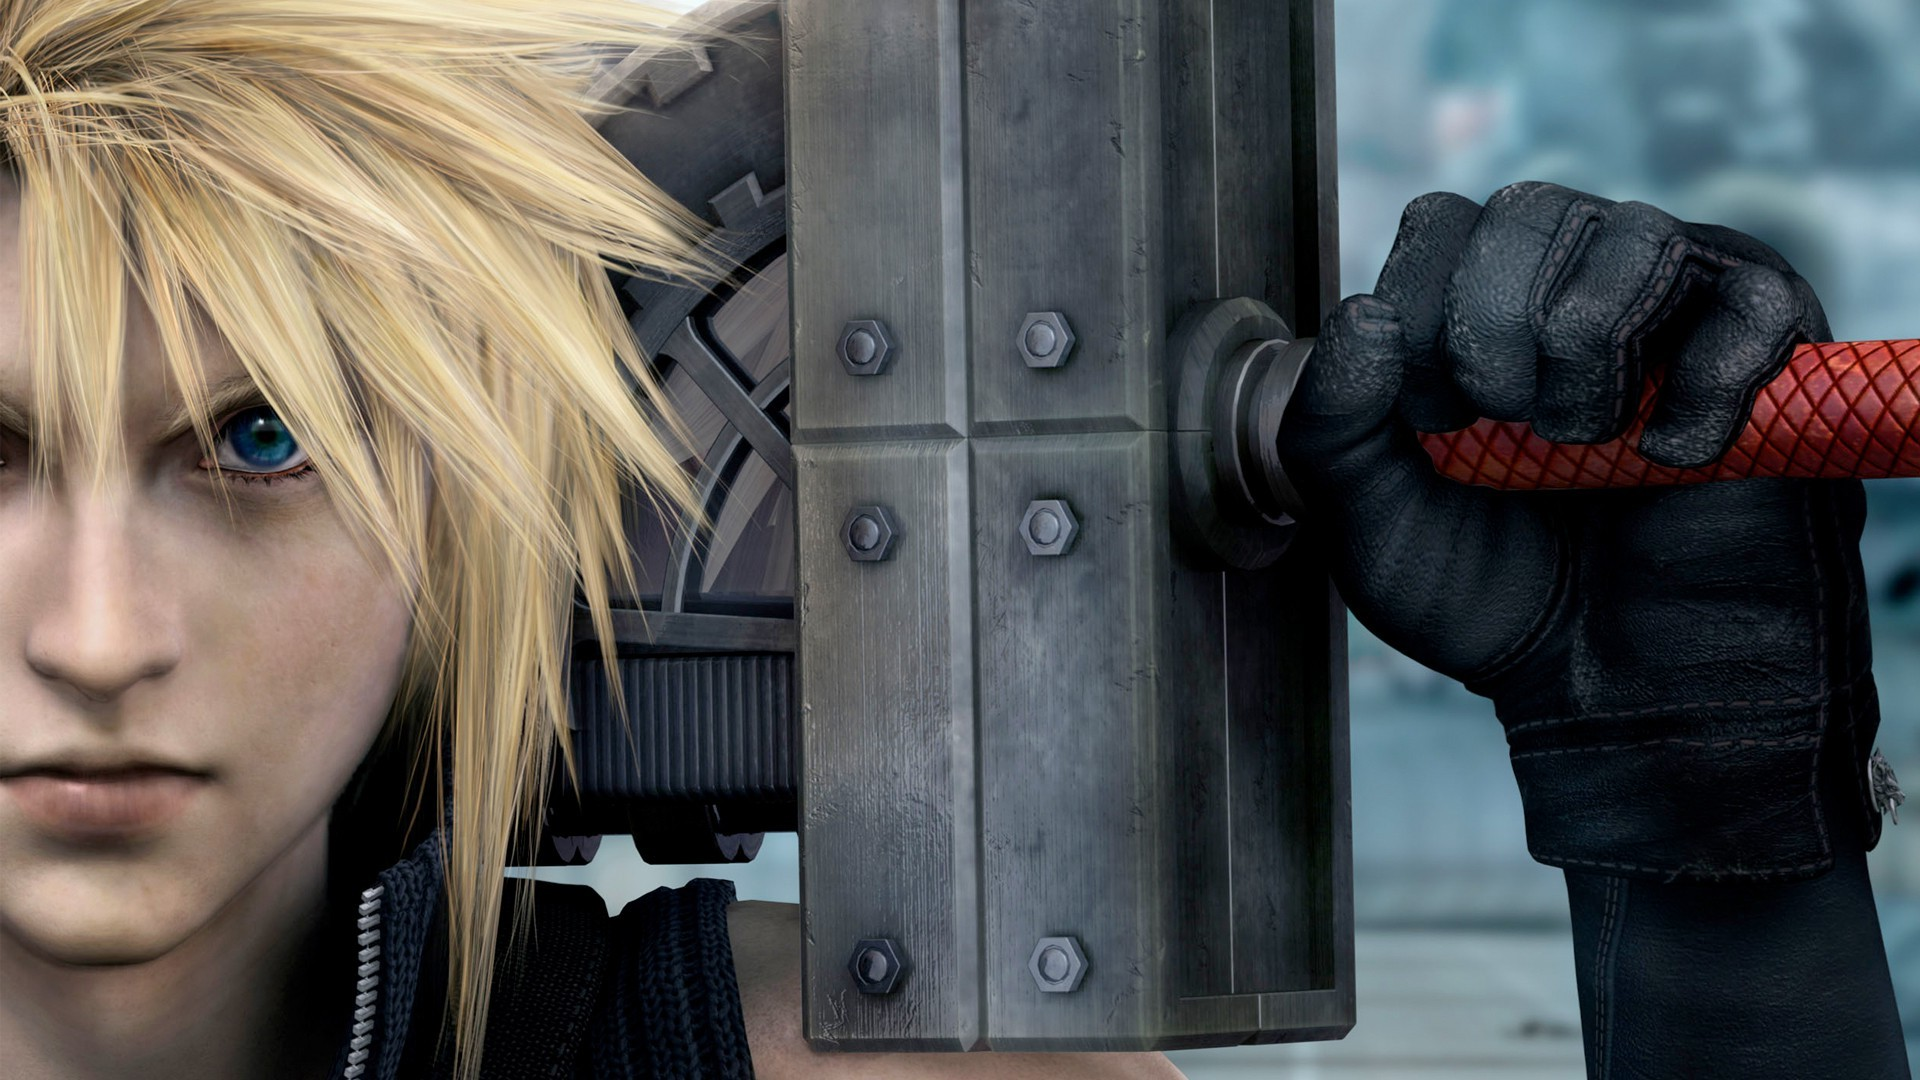 Final Fantasy VII, Cloud Strife Wallpapers HD / Desktop and Mobile  Backgrounds